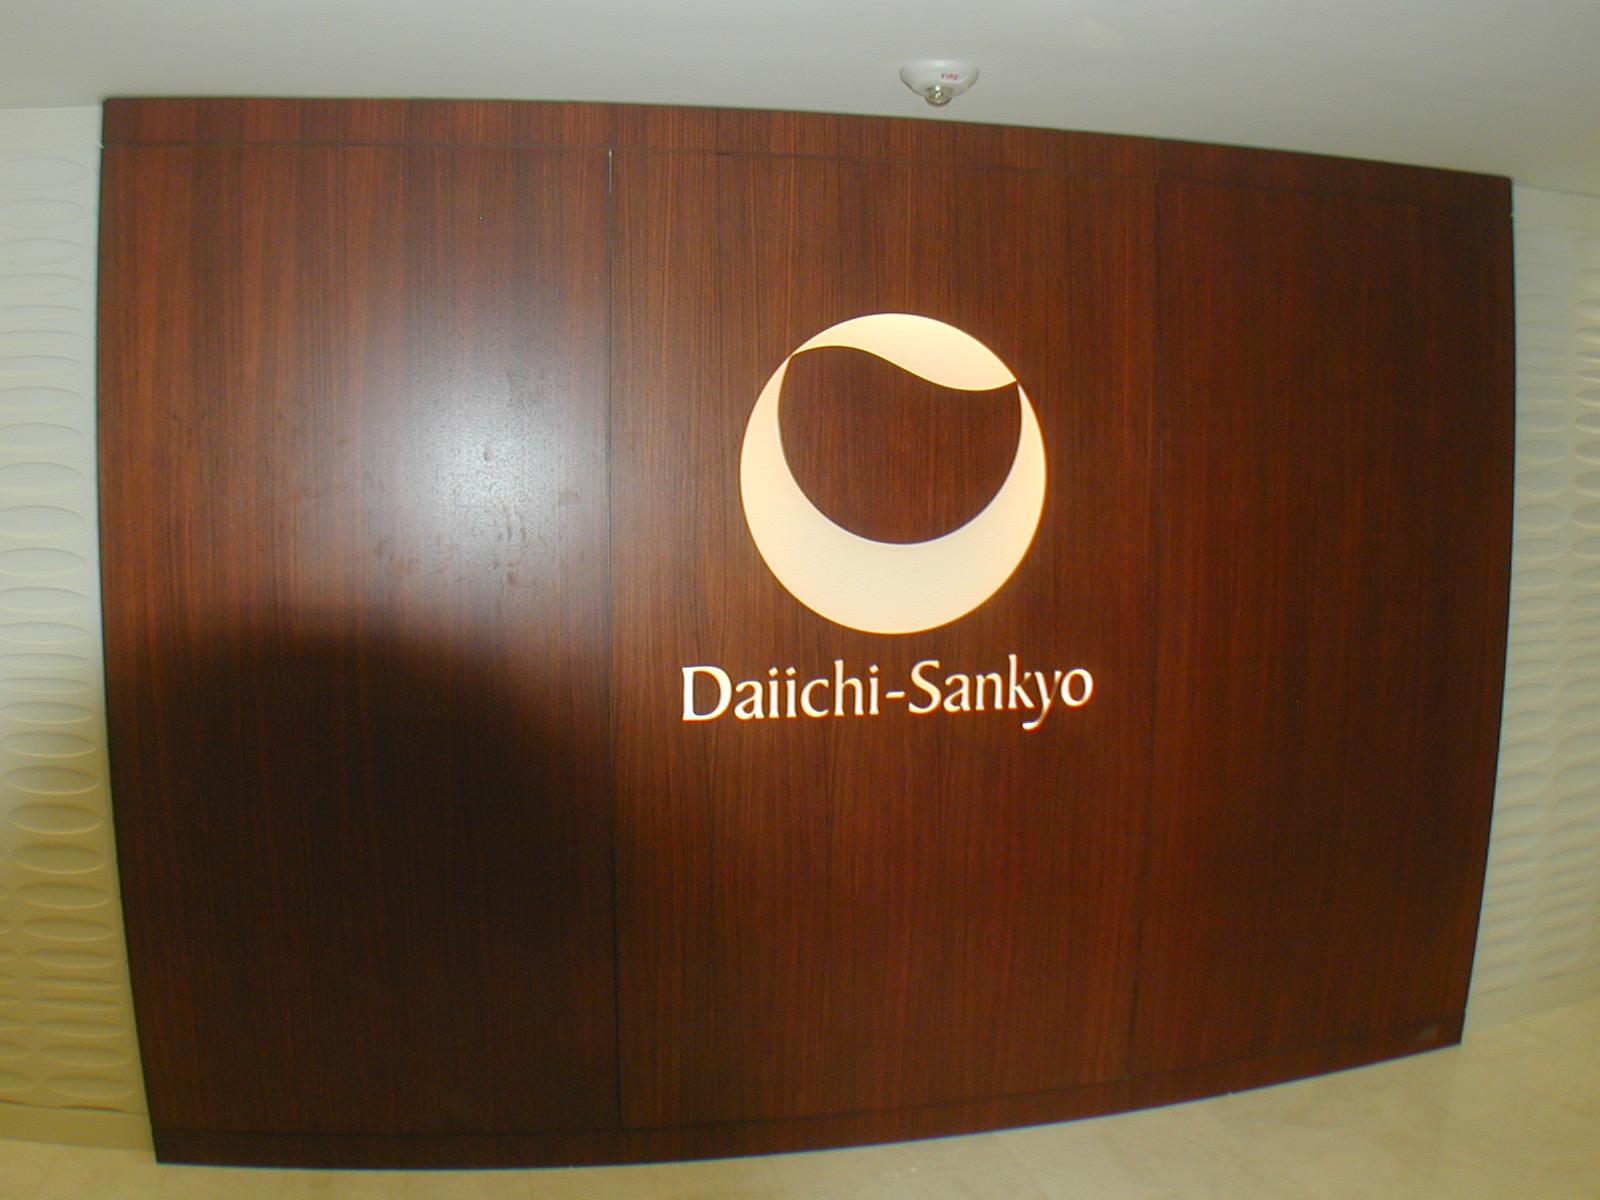 m_projects_0- Old Jobs_Daiichi Sankyo_Pics_P1010125.JPG